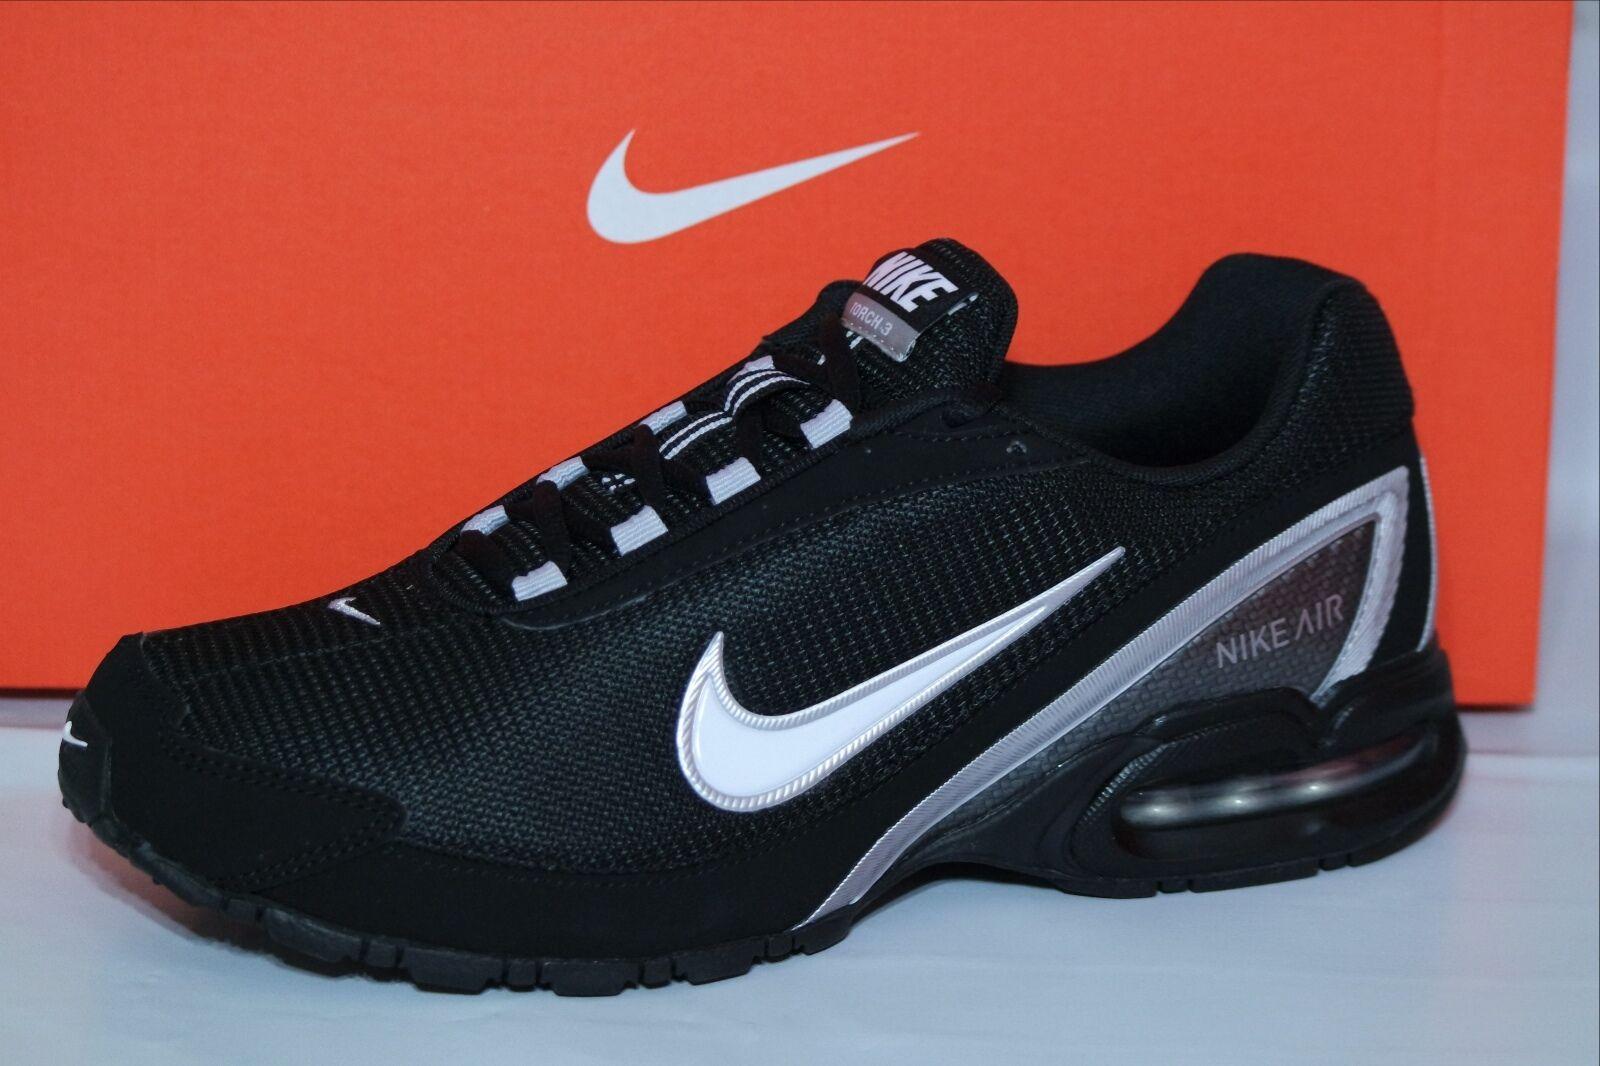 Nike Mens Air Max Torch  Sl Running Shoes